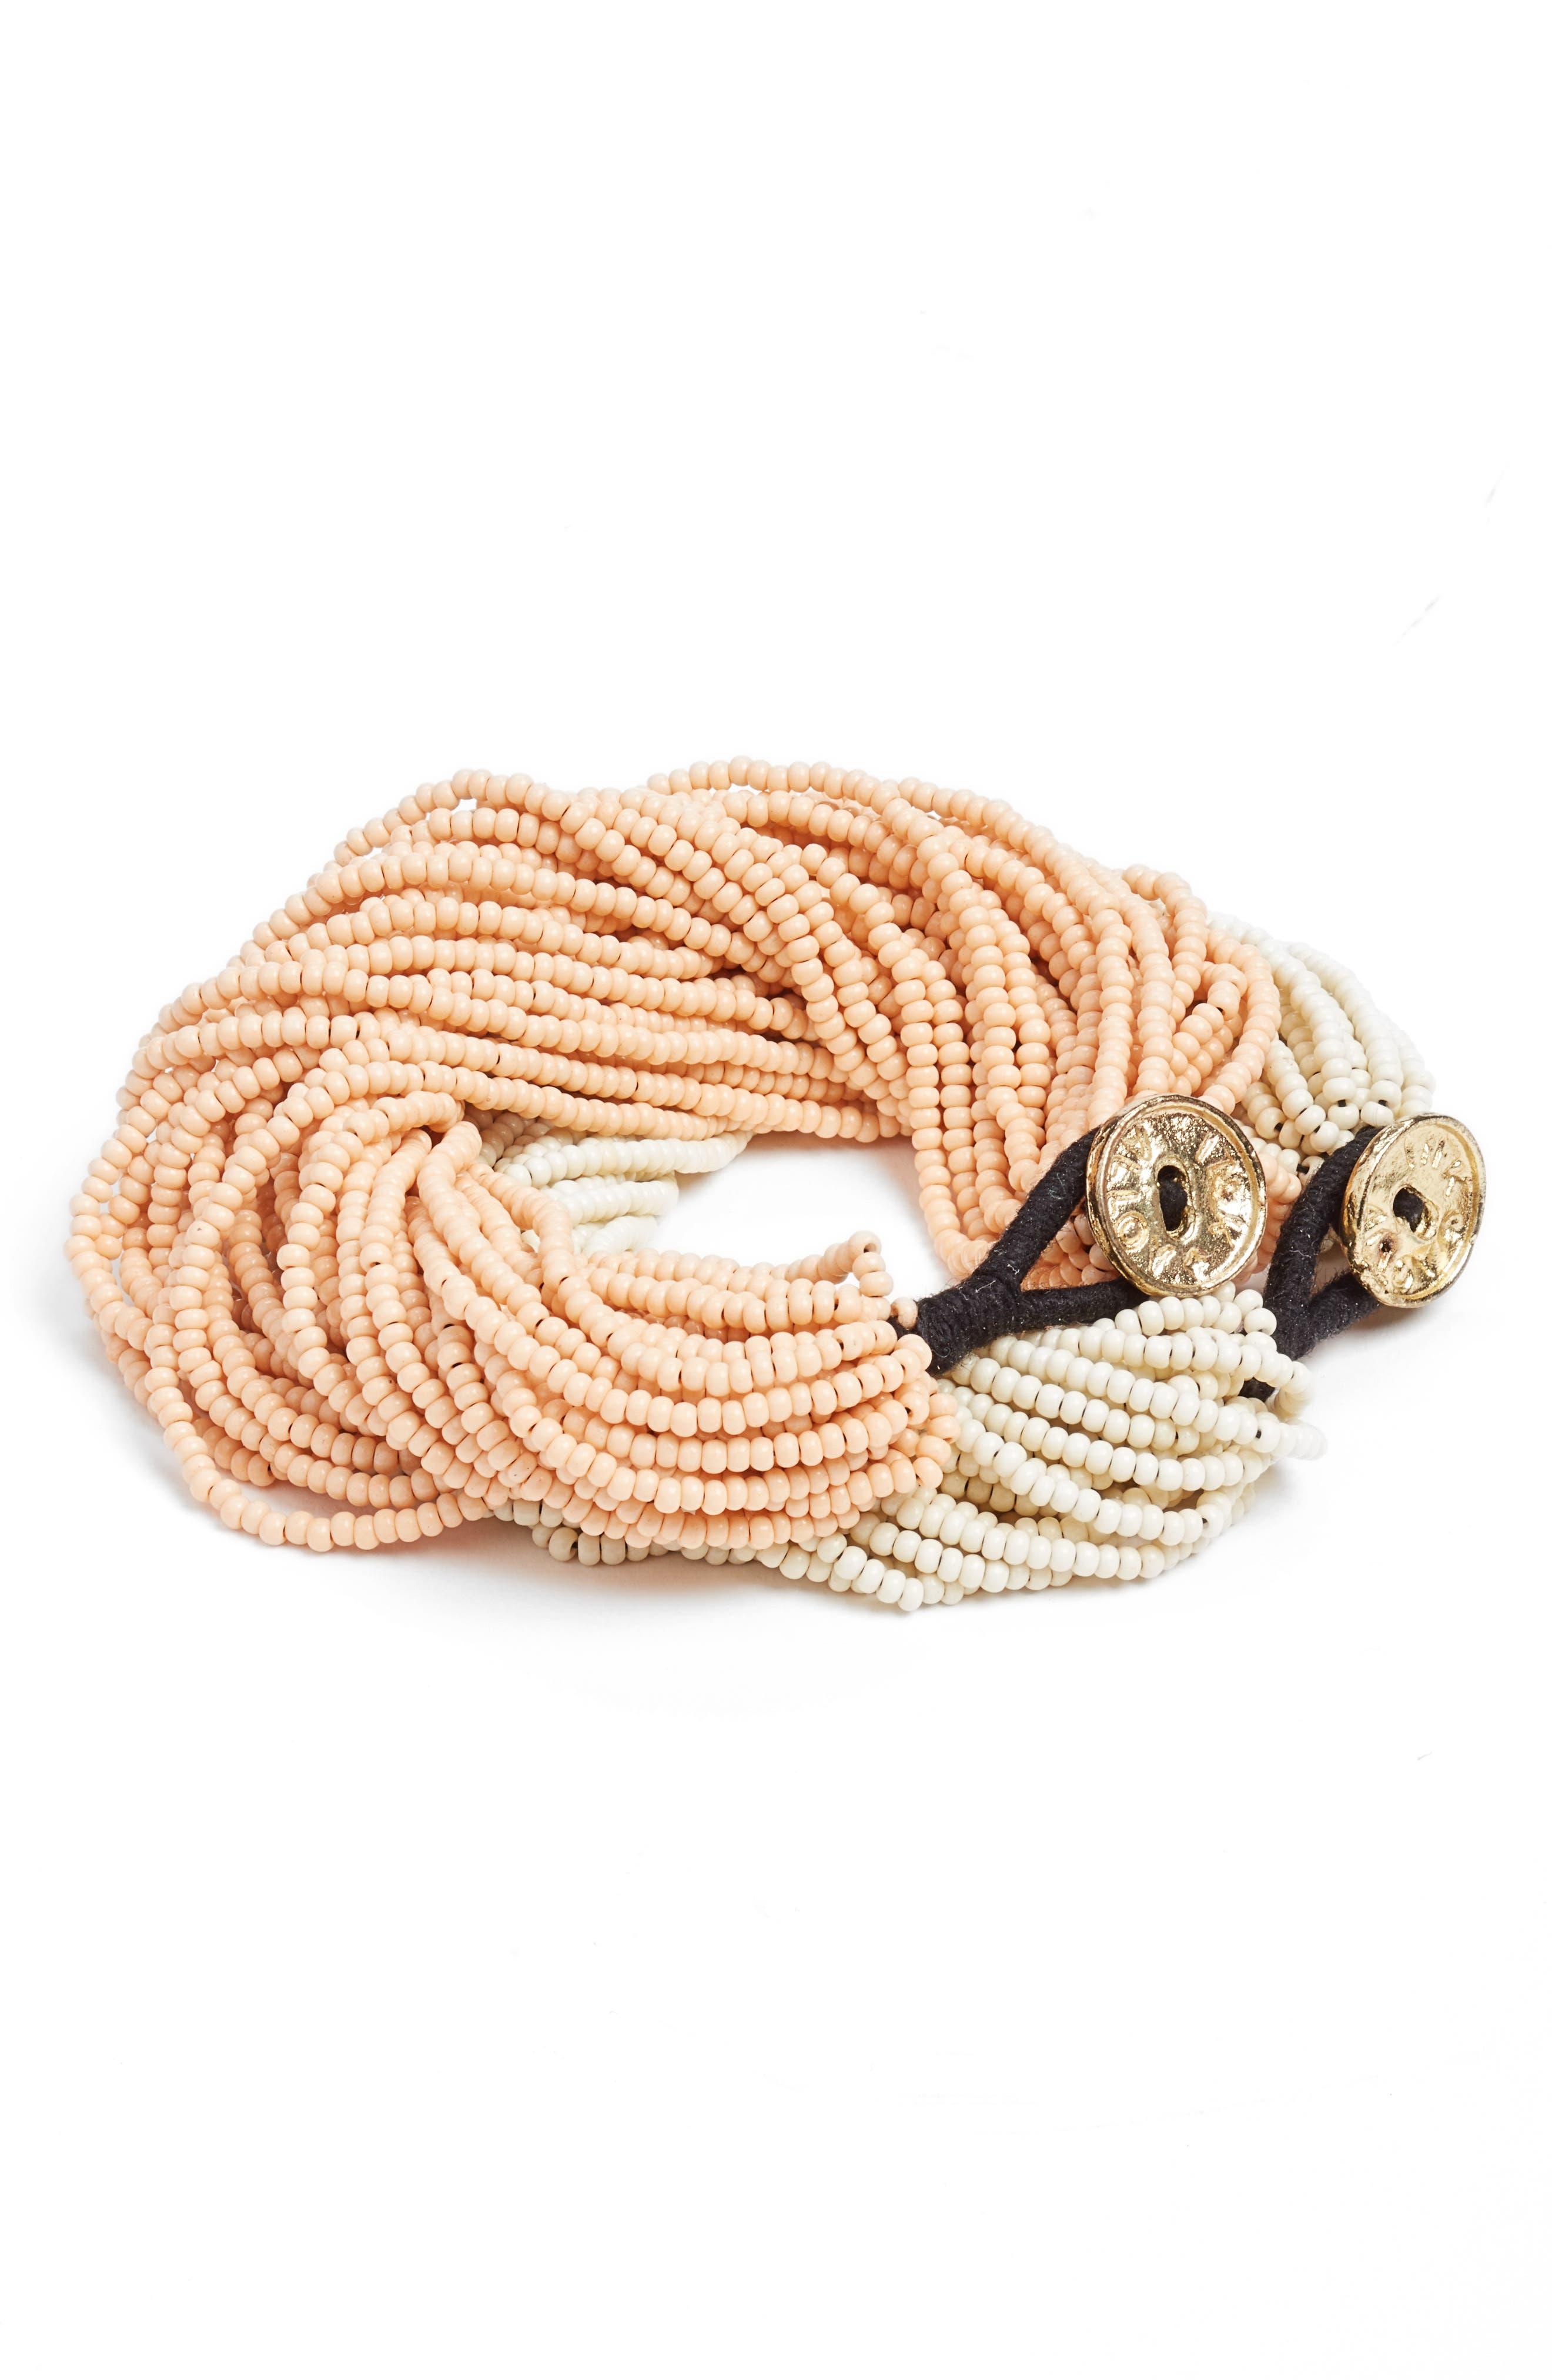 Set of 2 Beaded Bracelets,                         Main,                         color, PINK/ IVORY